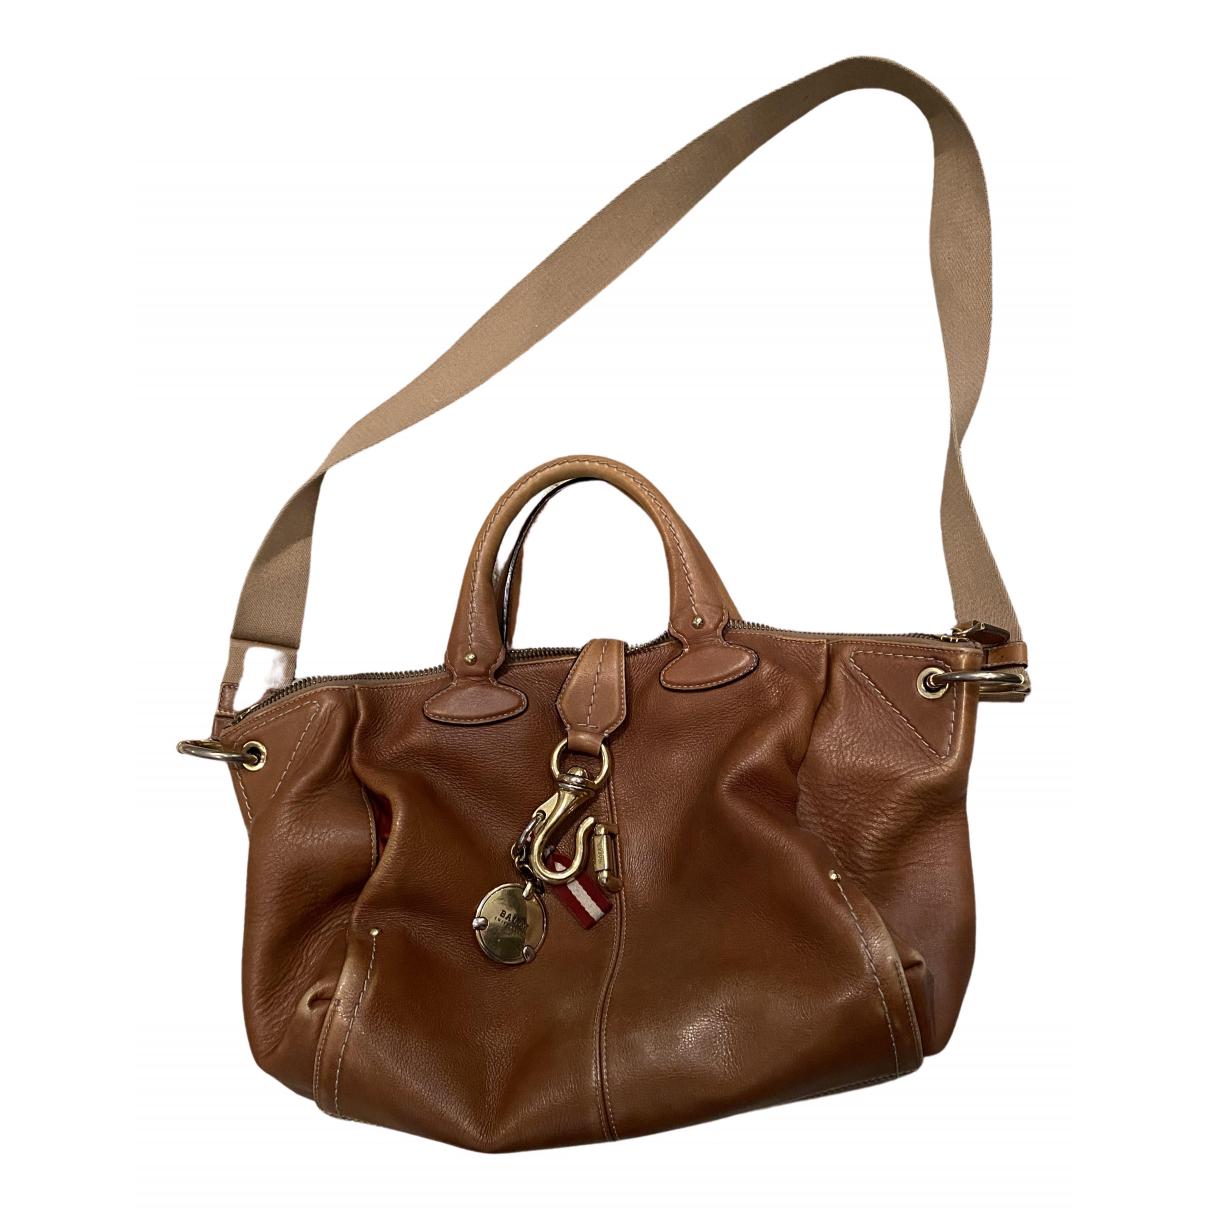 Bally \N Beige Leather handbag for Women \N